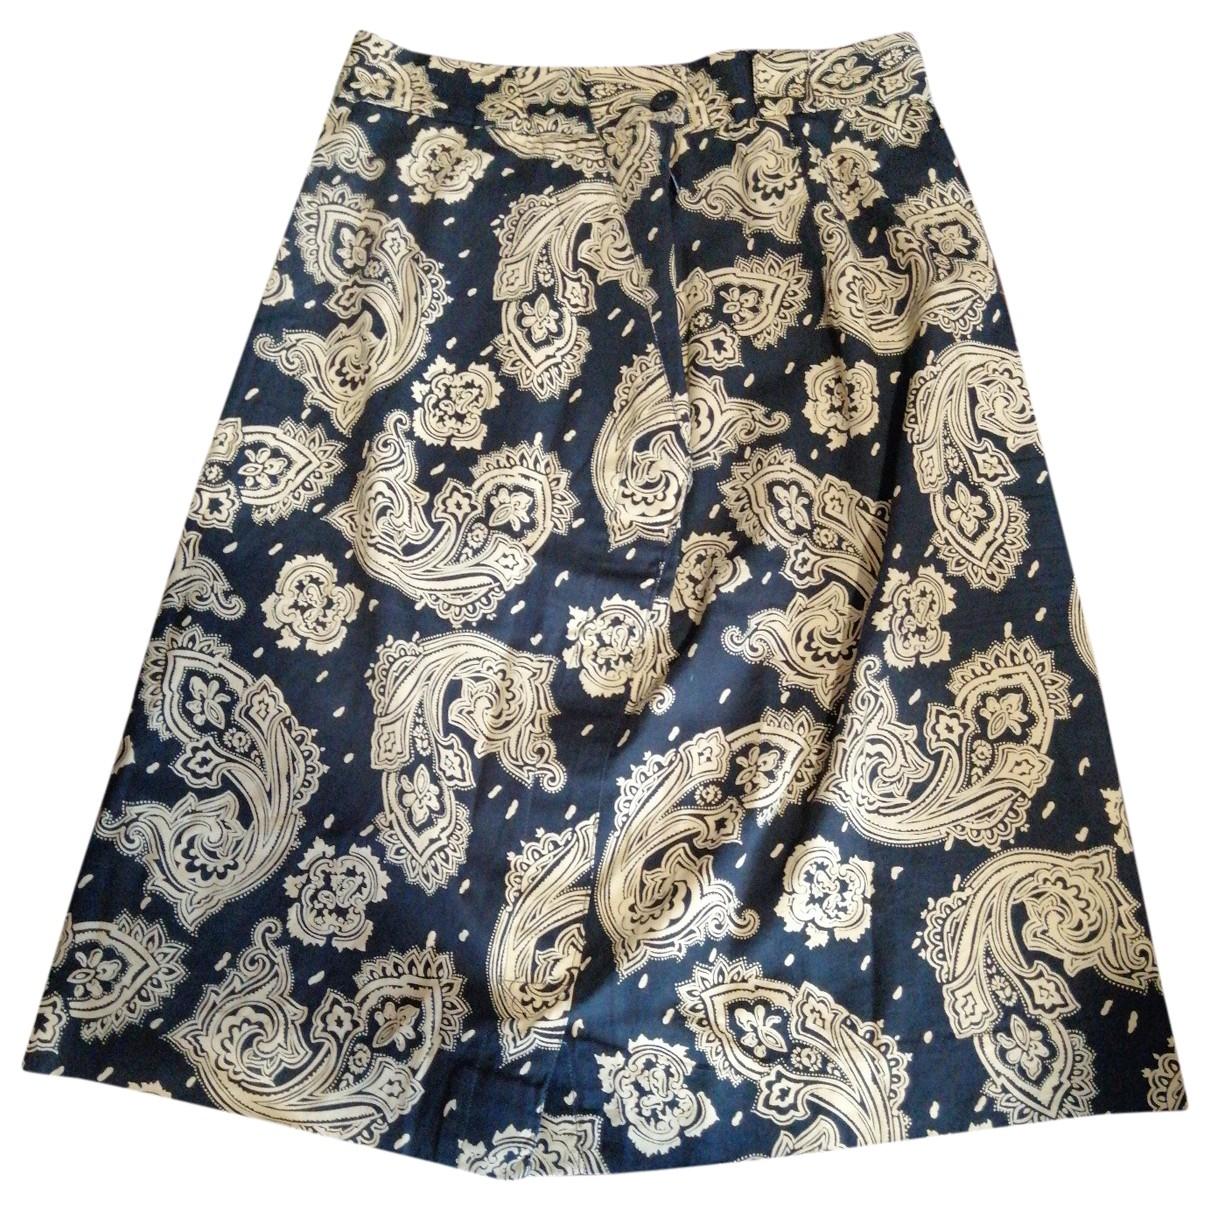 Gianni Versace \N Multicolour Cotton skirt for Women 40 IT